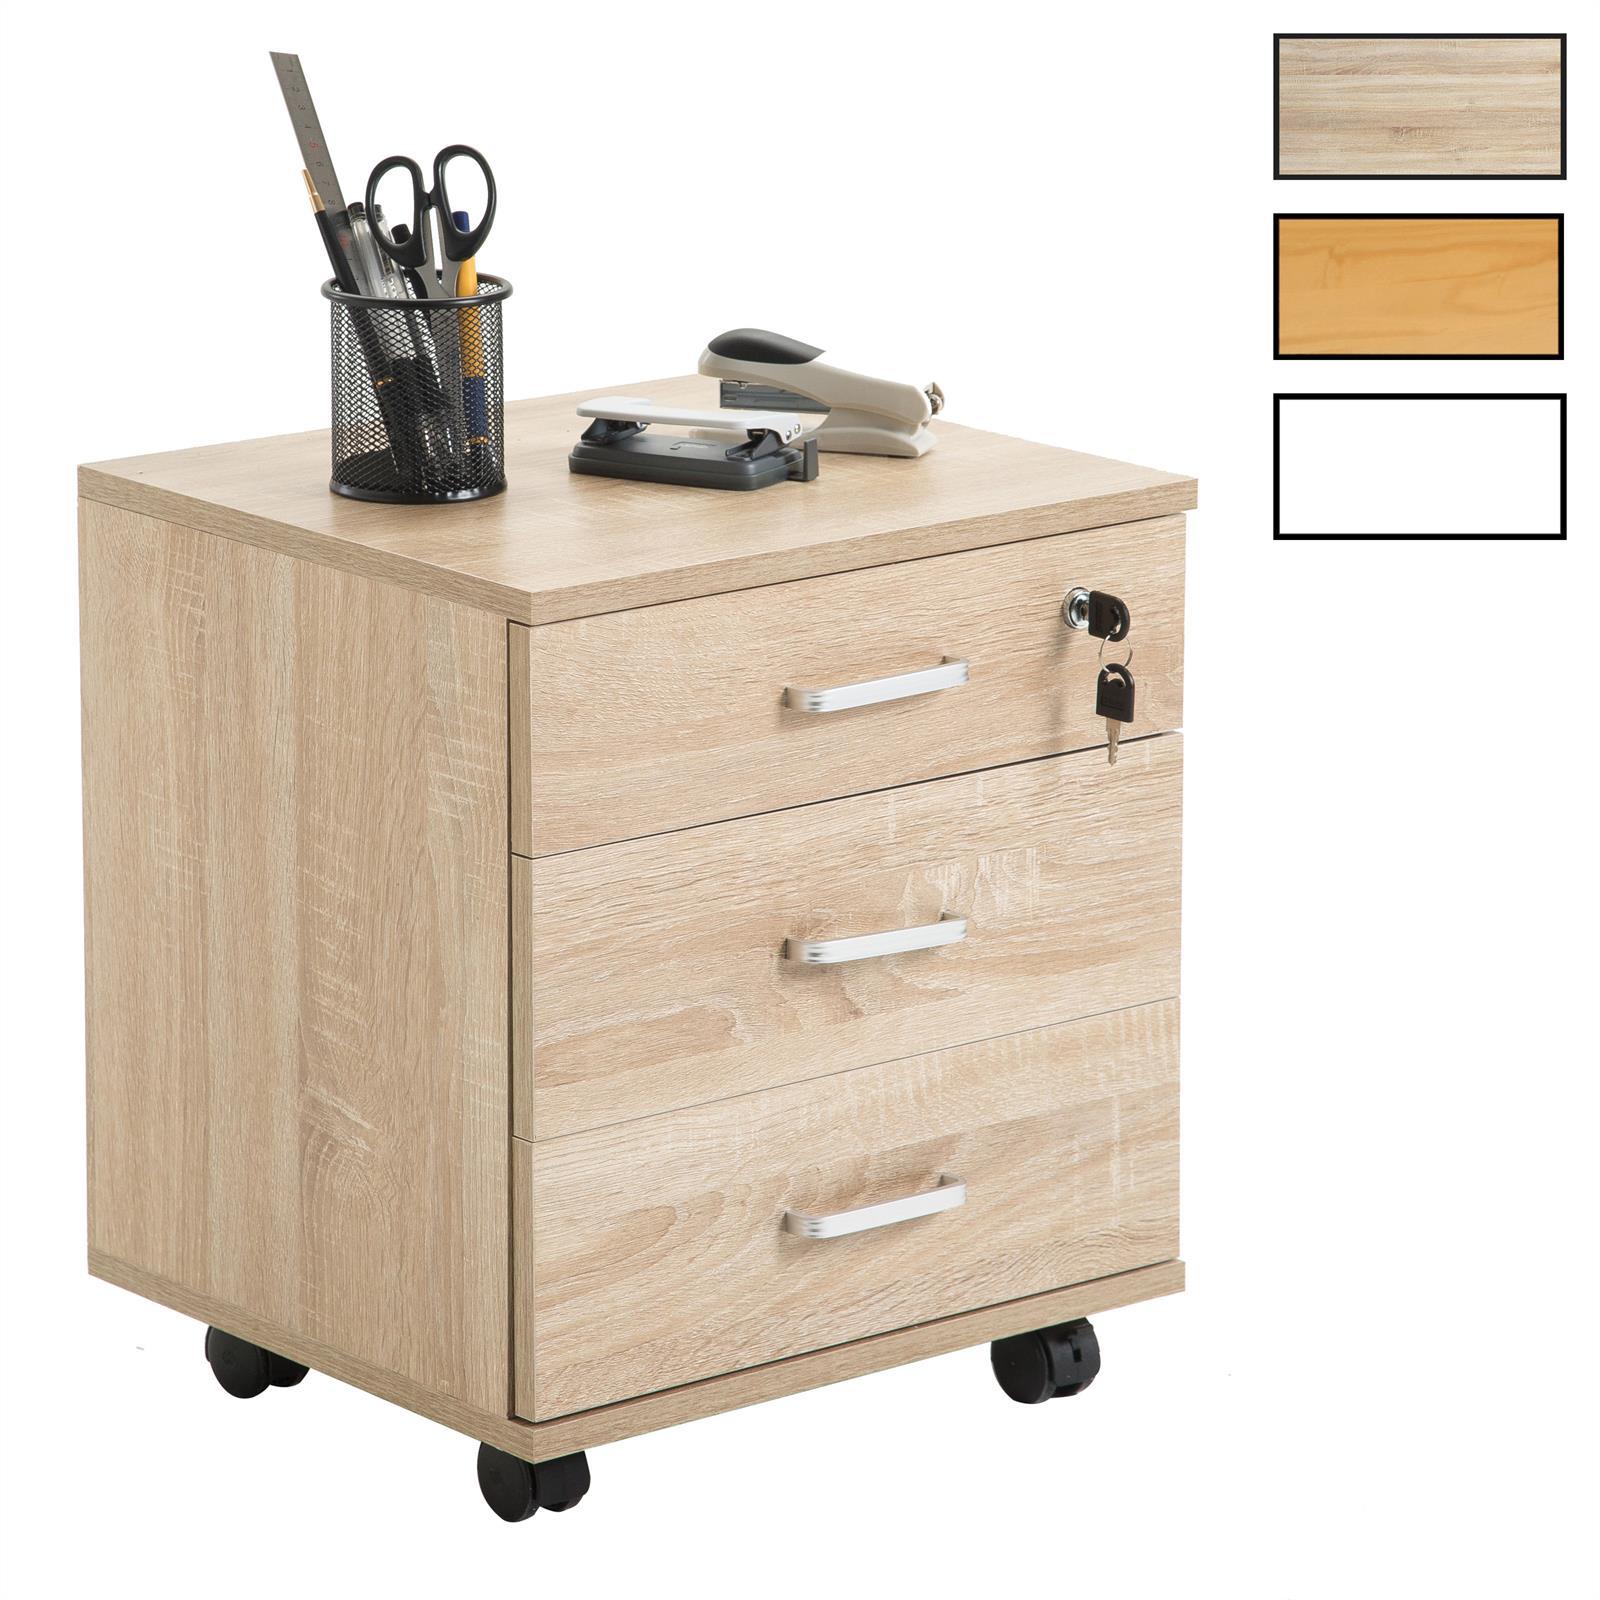 rollcontainer saturn mit 3 schubladen caro m bel. Black Bedroom Furniture Sets. Home Design Ideas